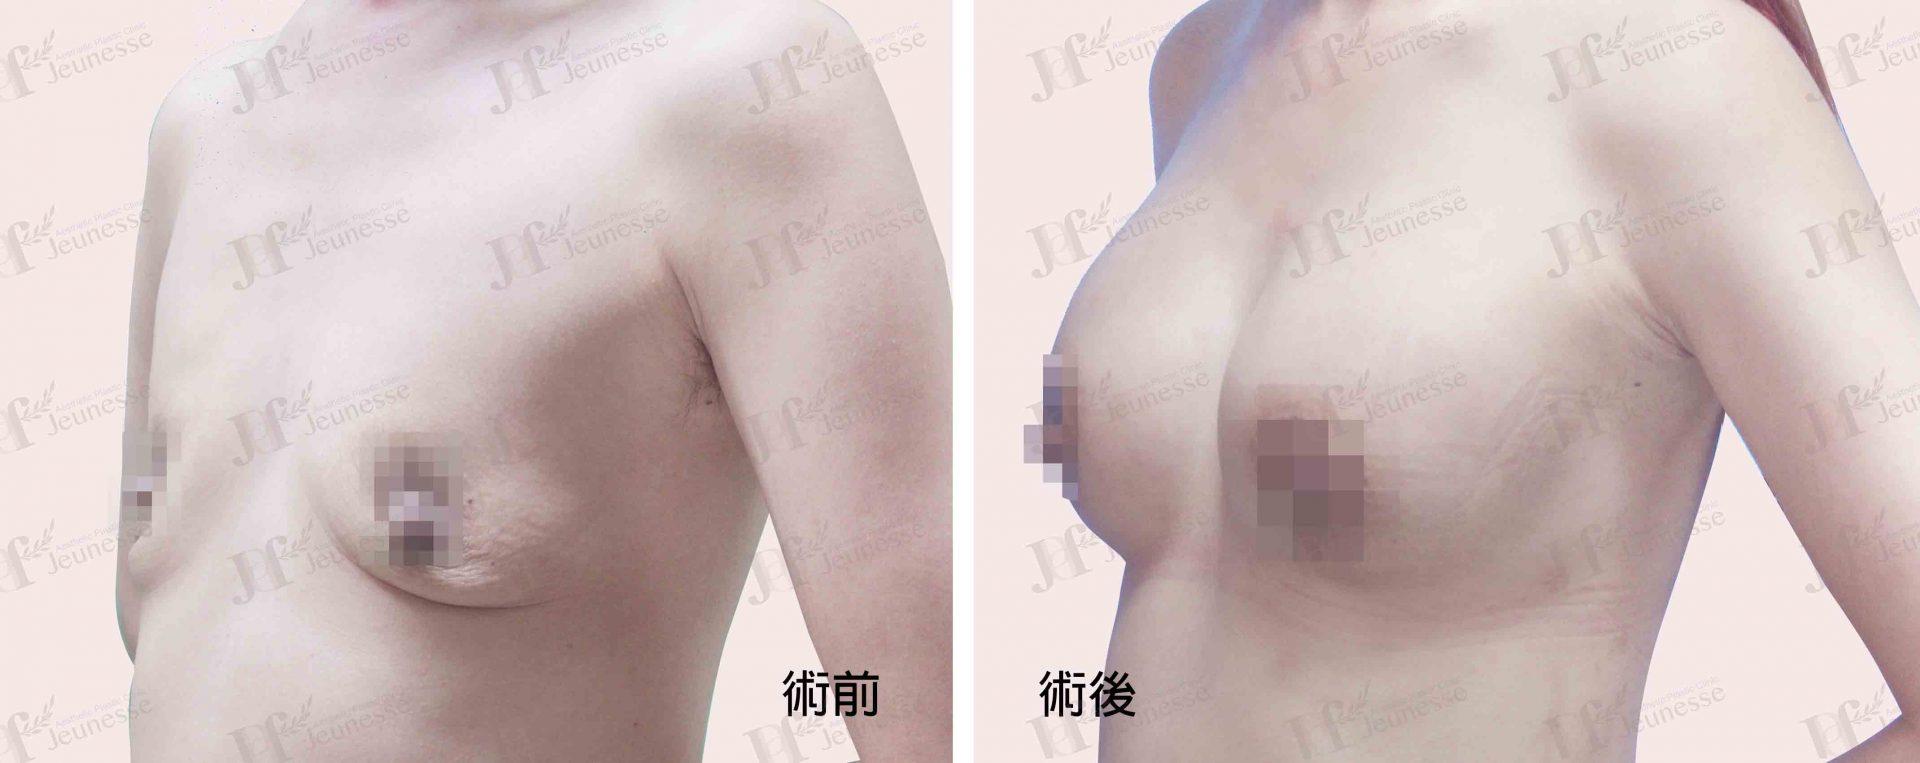 Breast Augmentation- Silicone implants -case2 45度-浮水印